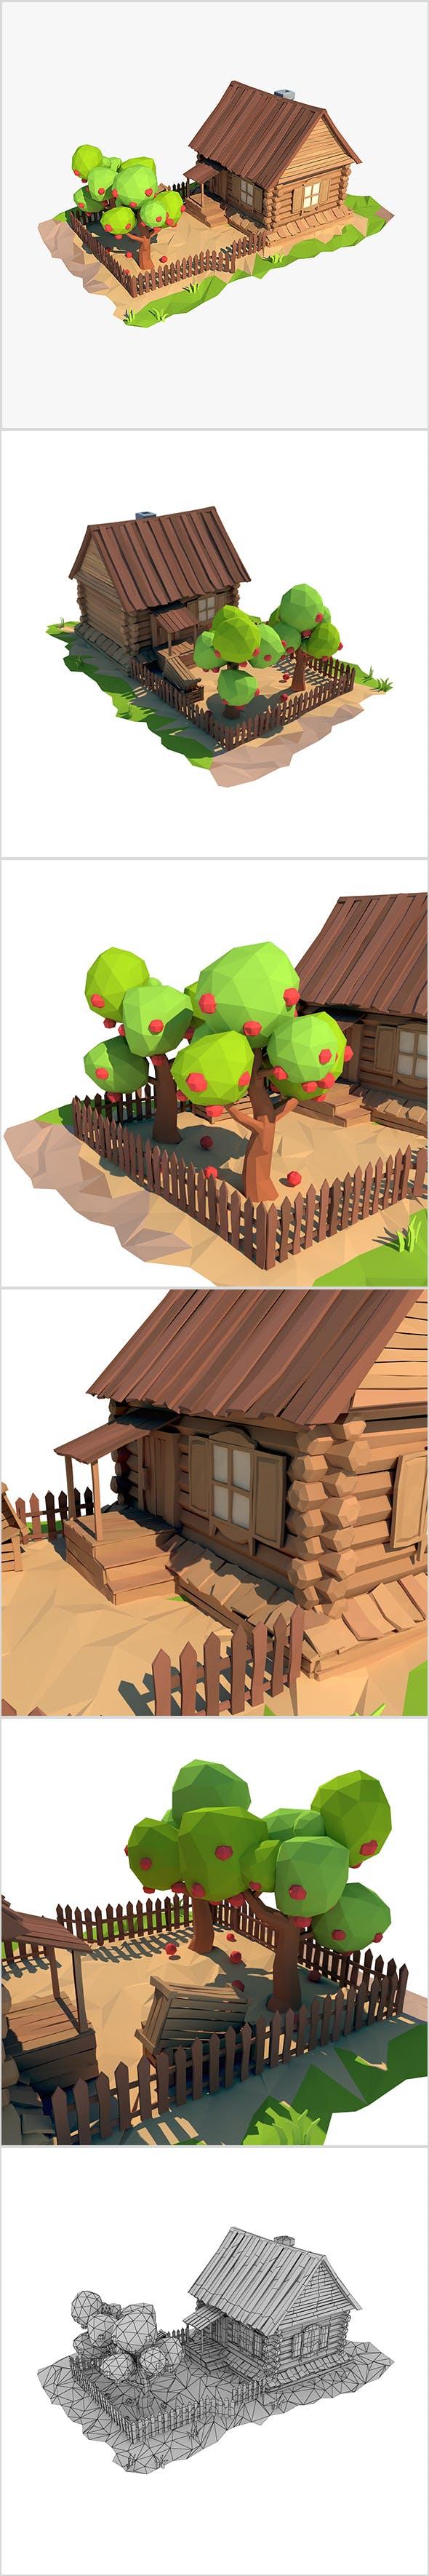 Cartoon wooden house - 3DOcean Item for Sale